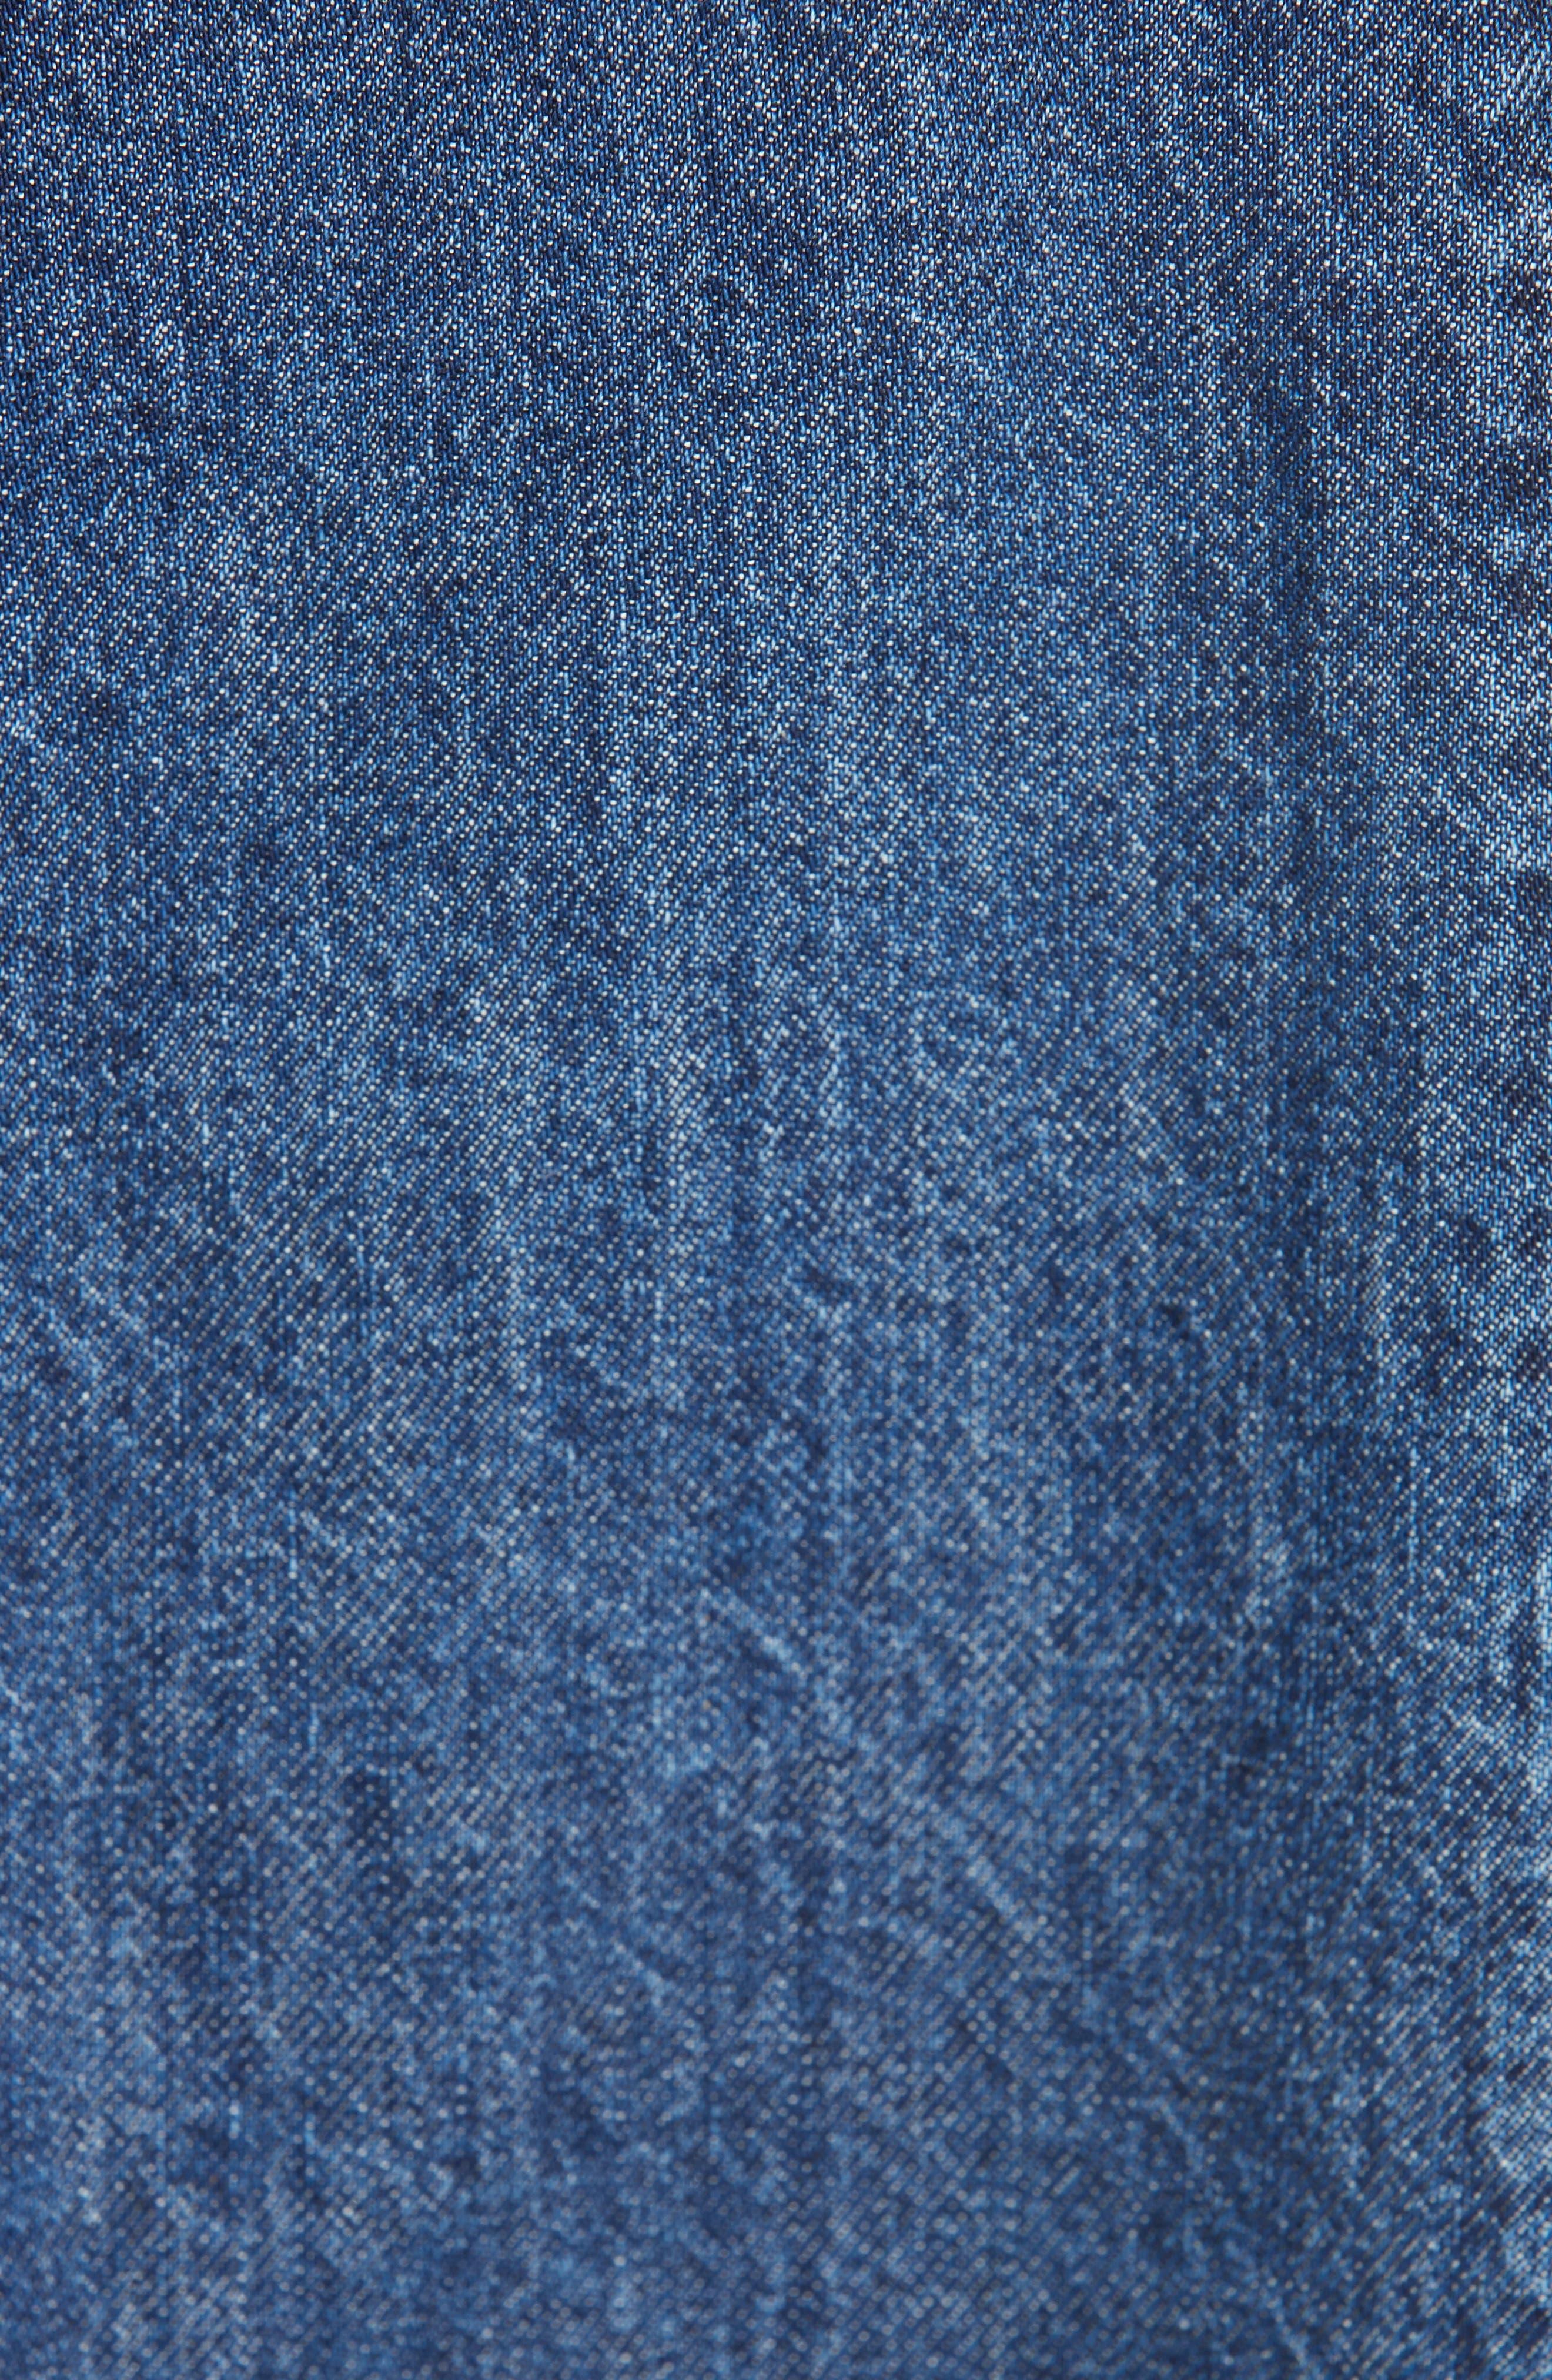 Bleu Bicolor Denim Midi Skirt,                             Alternate thumbnail 5, color,                             INDIGO/ BLACK